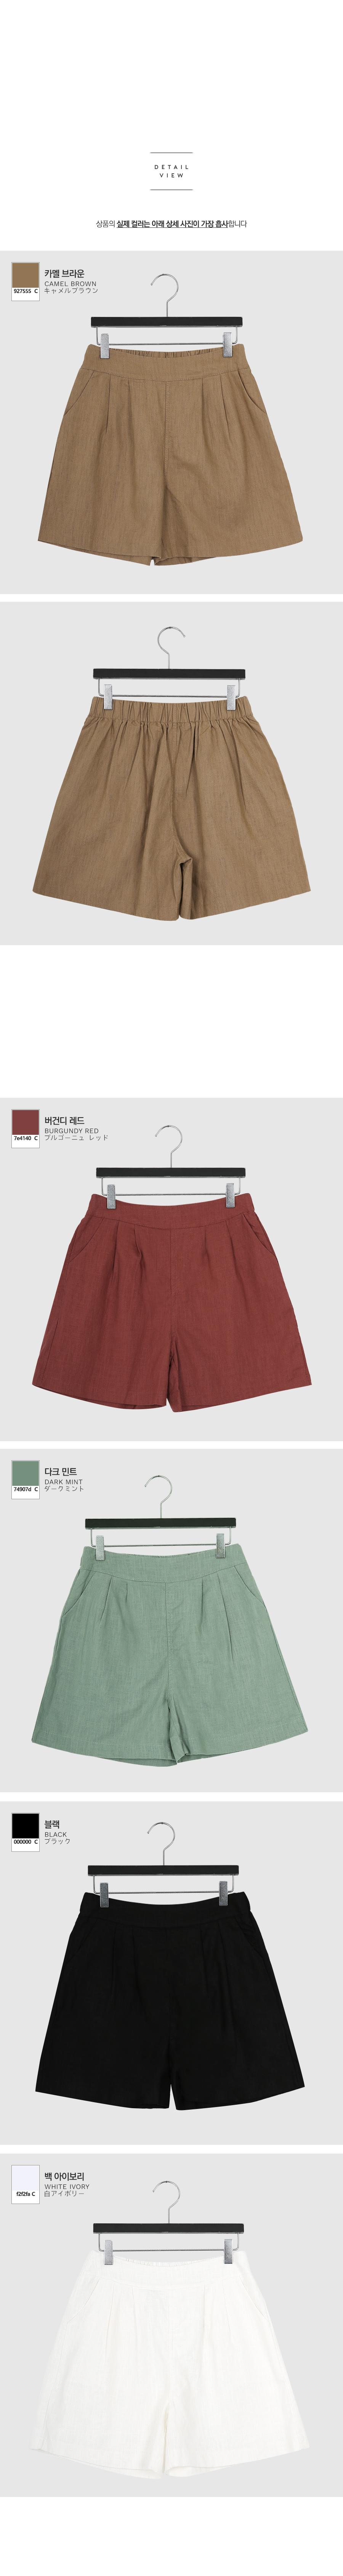 Basic Linen Shorts